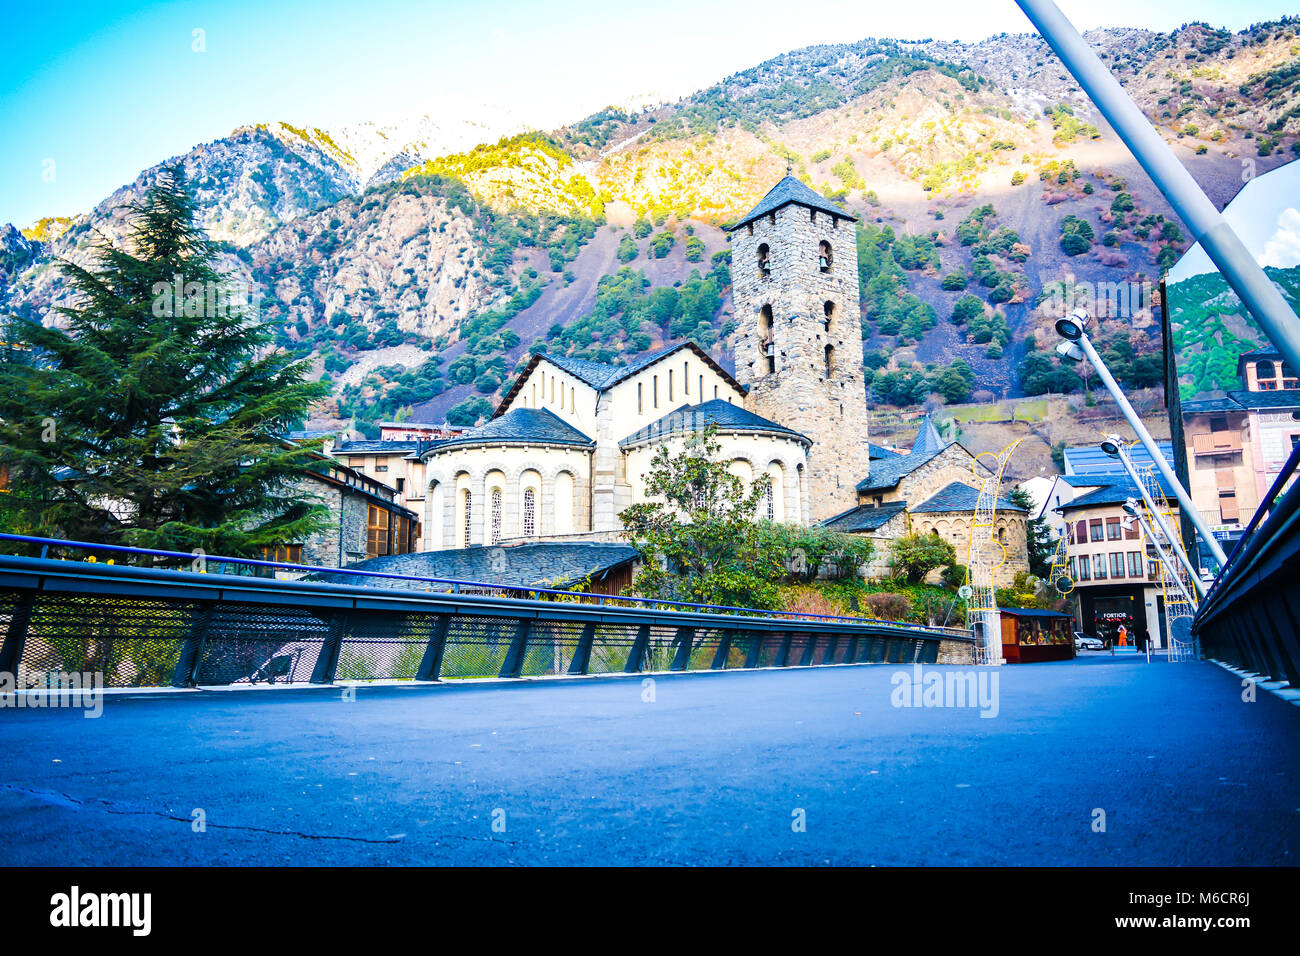 Sant Esteve church in Andorra la Vella, Andorra - Stock Image